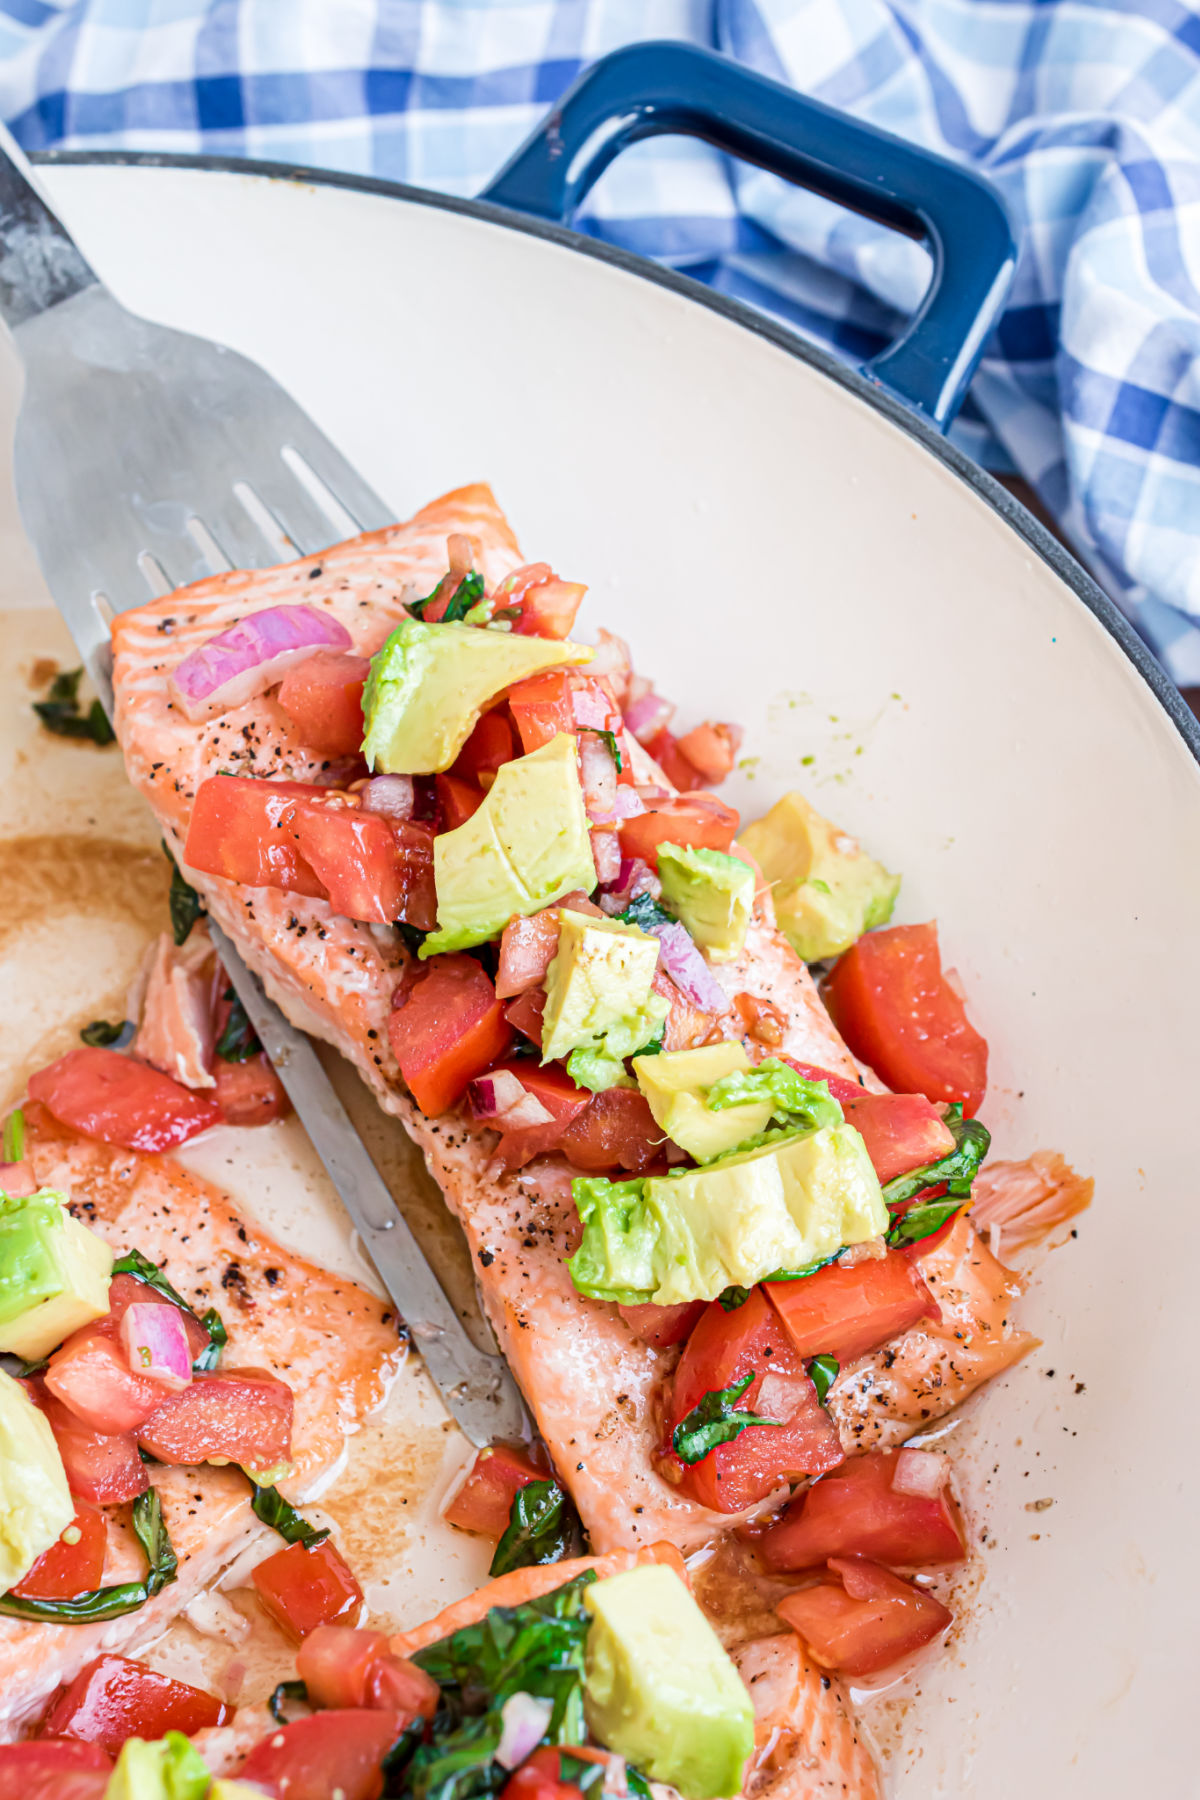 Bruschetta and avocado on a baked salmon filet.